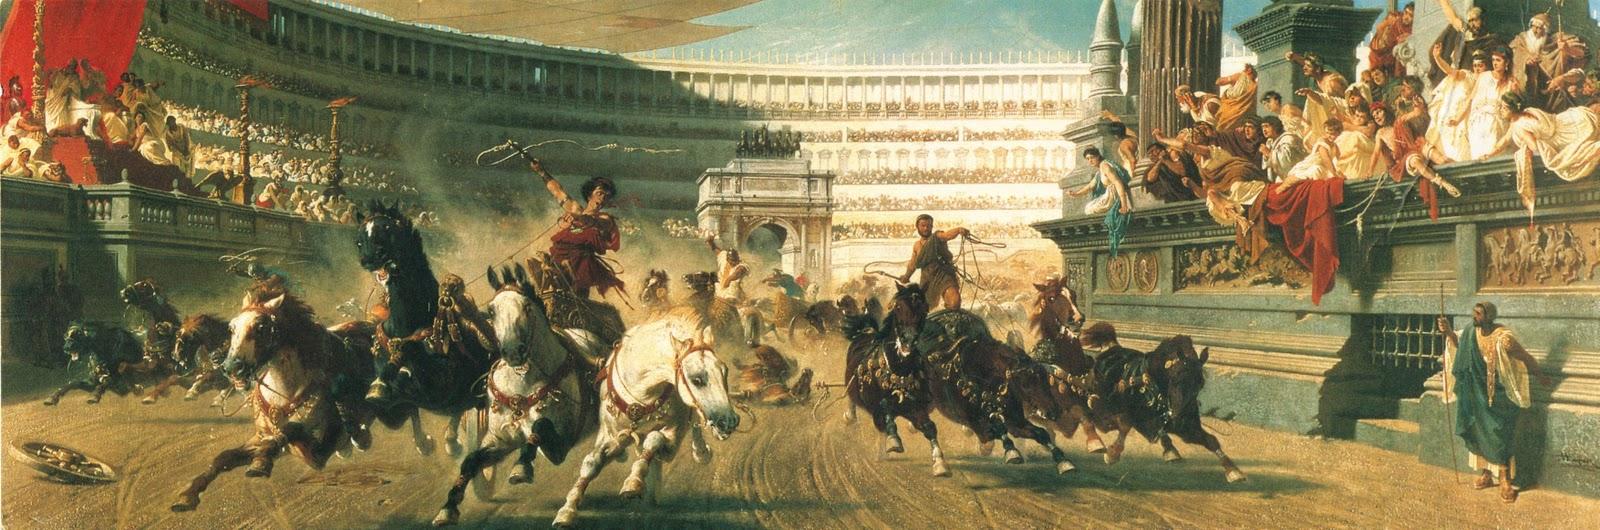 Alexander von Wagner The Chariot Race